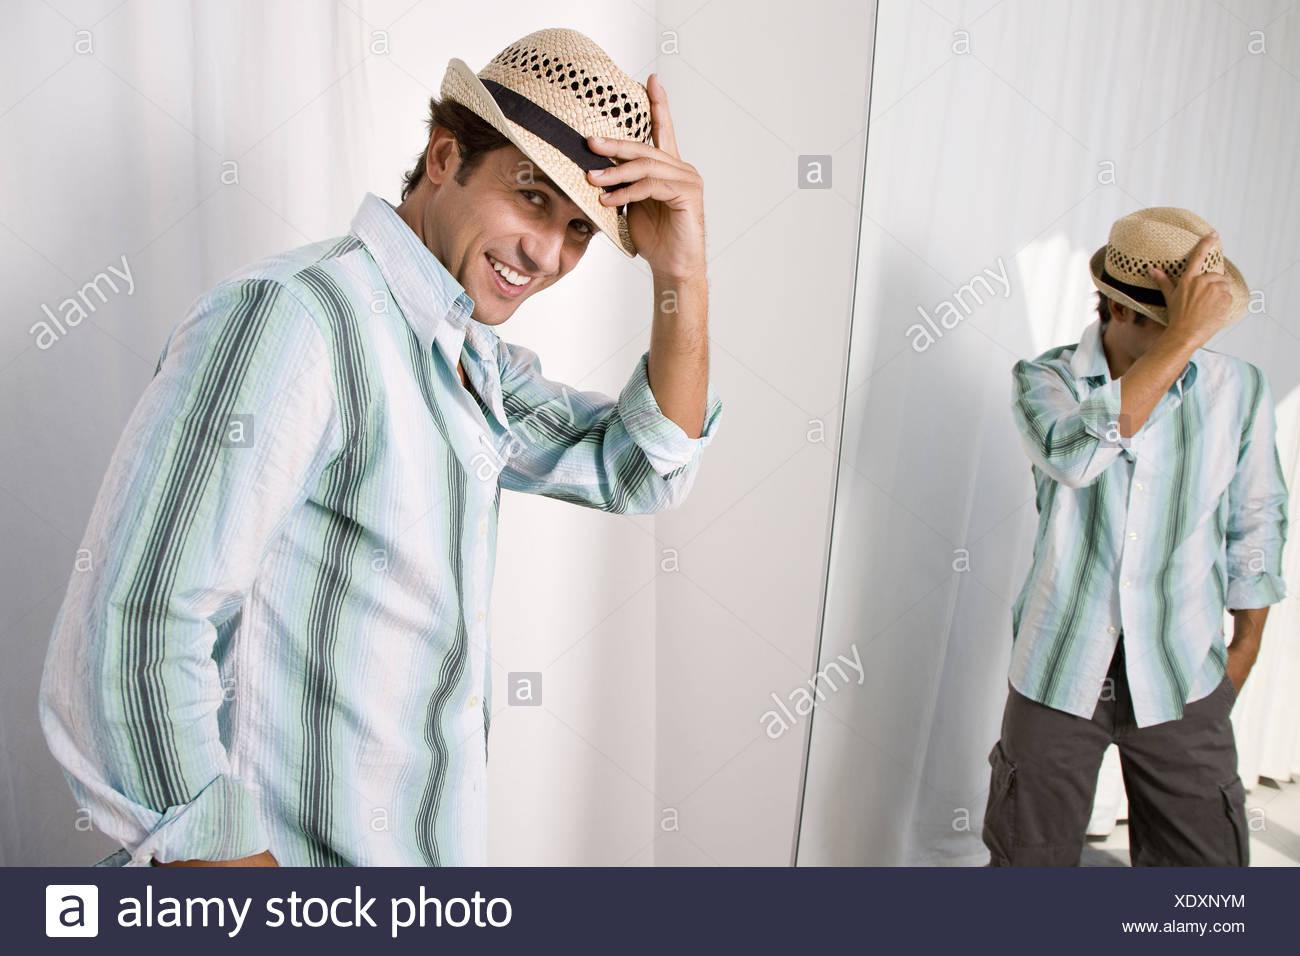 bc44f05b Man putting on hat Stock Photo: 283944408 - Alamy